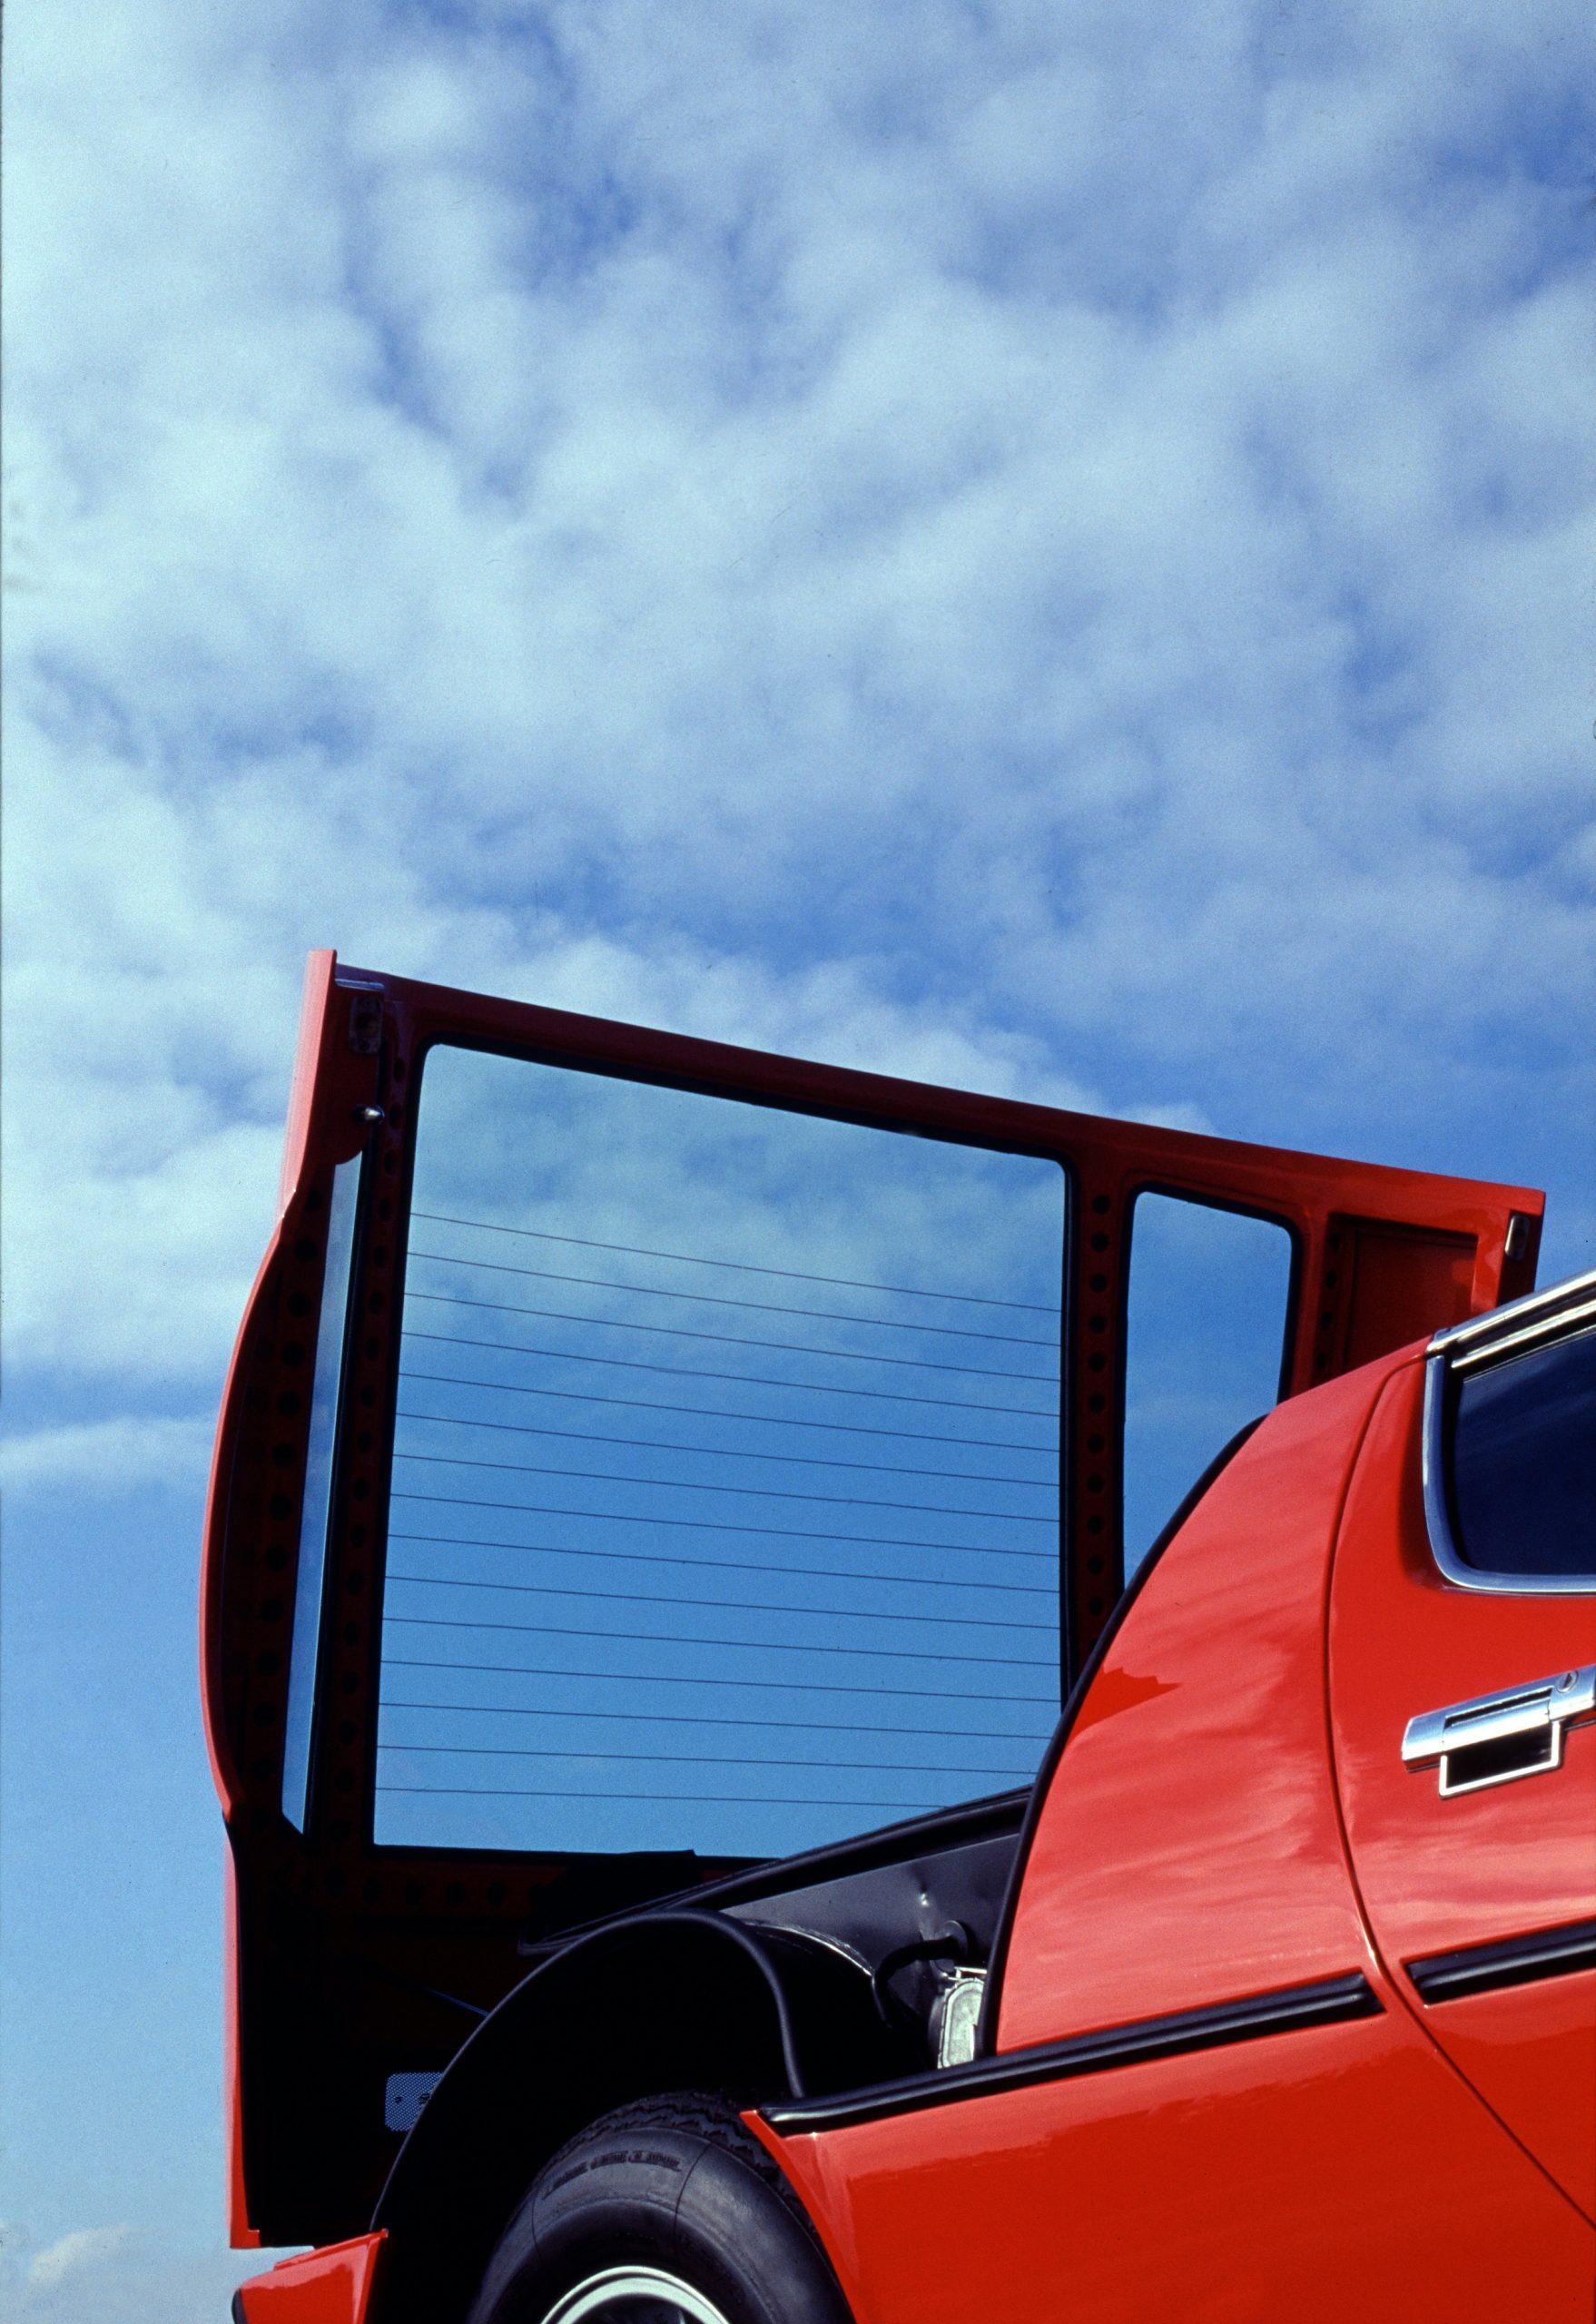 Maserati Bora rear hatch open